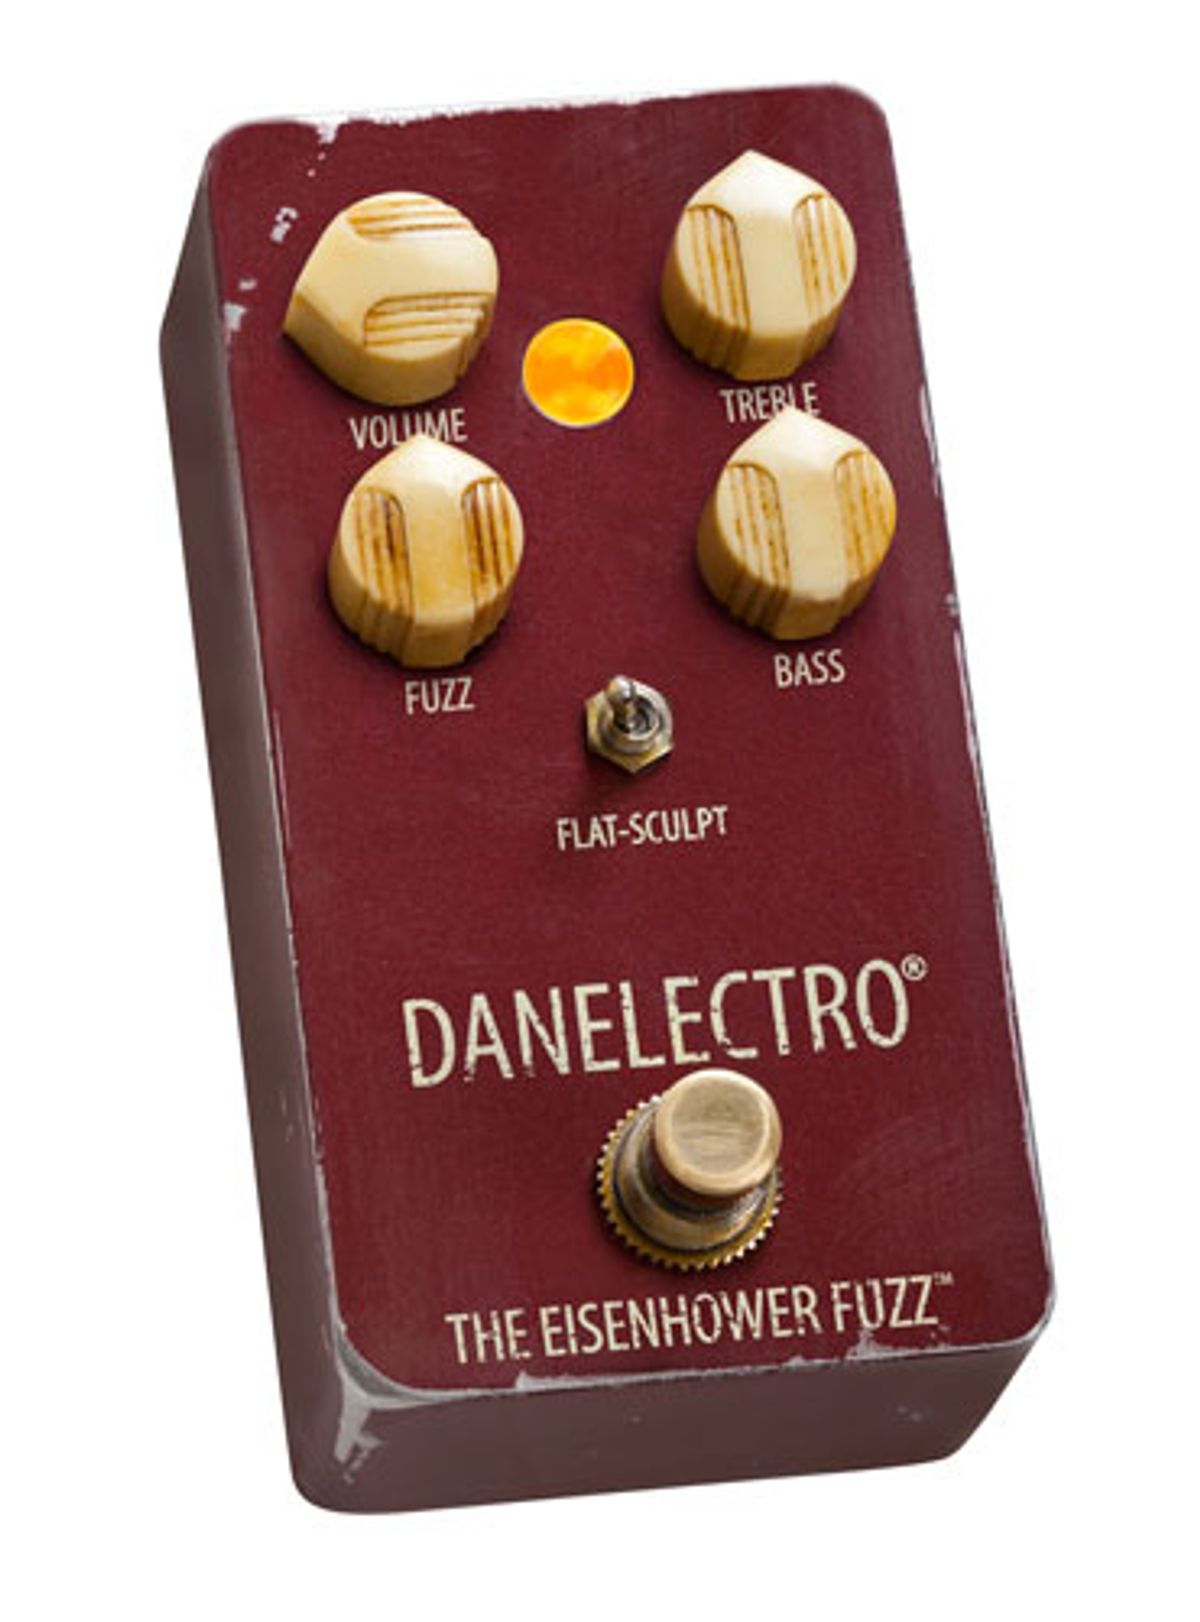 Danelectro Announces the Eisenhower Fuzz and the Breakdown